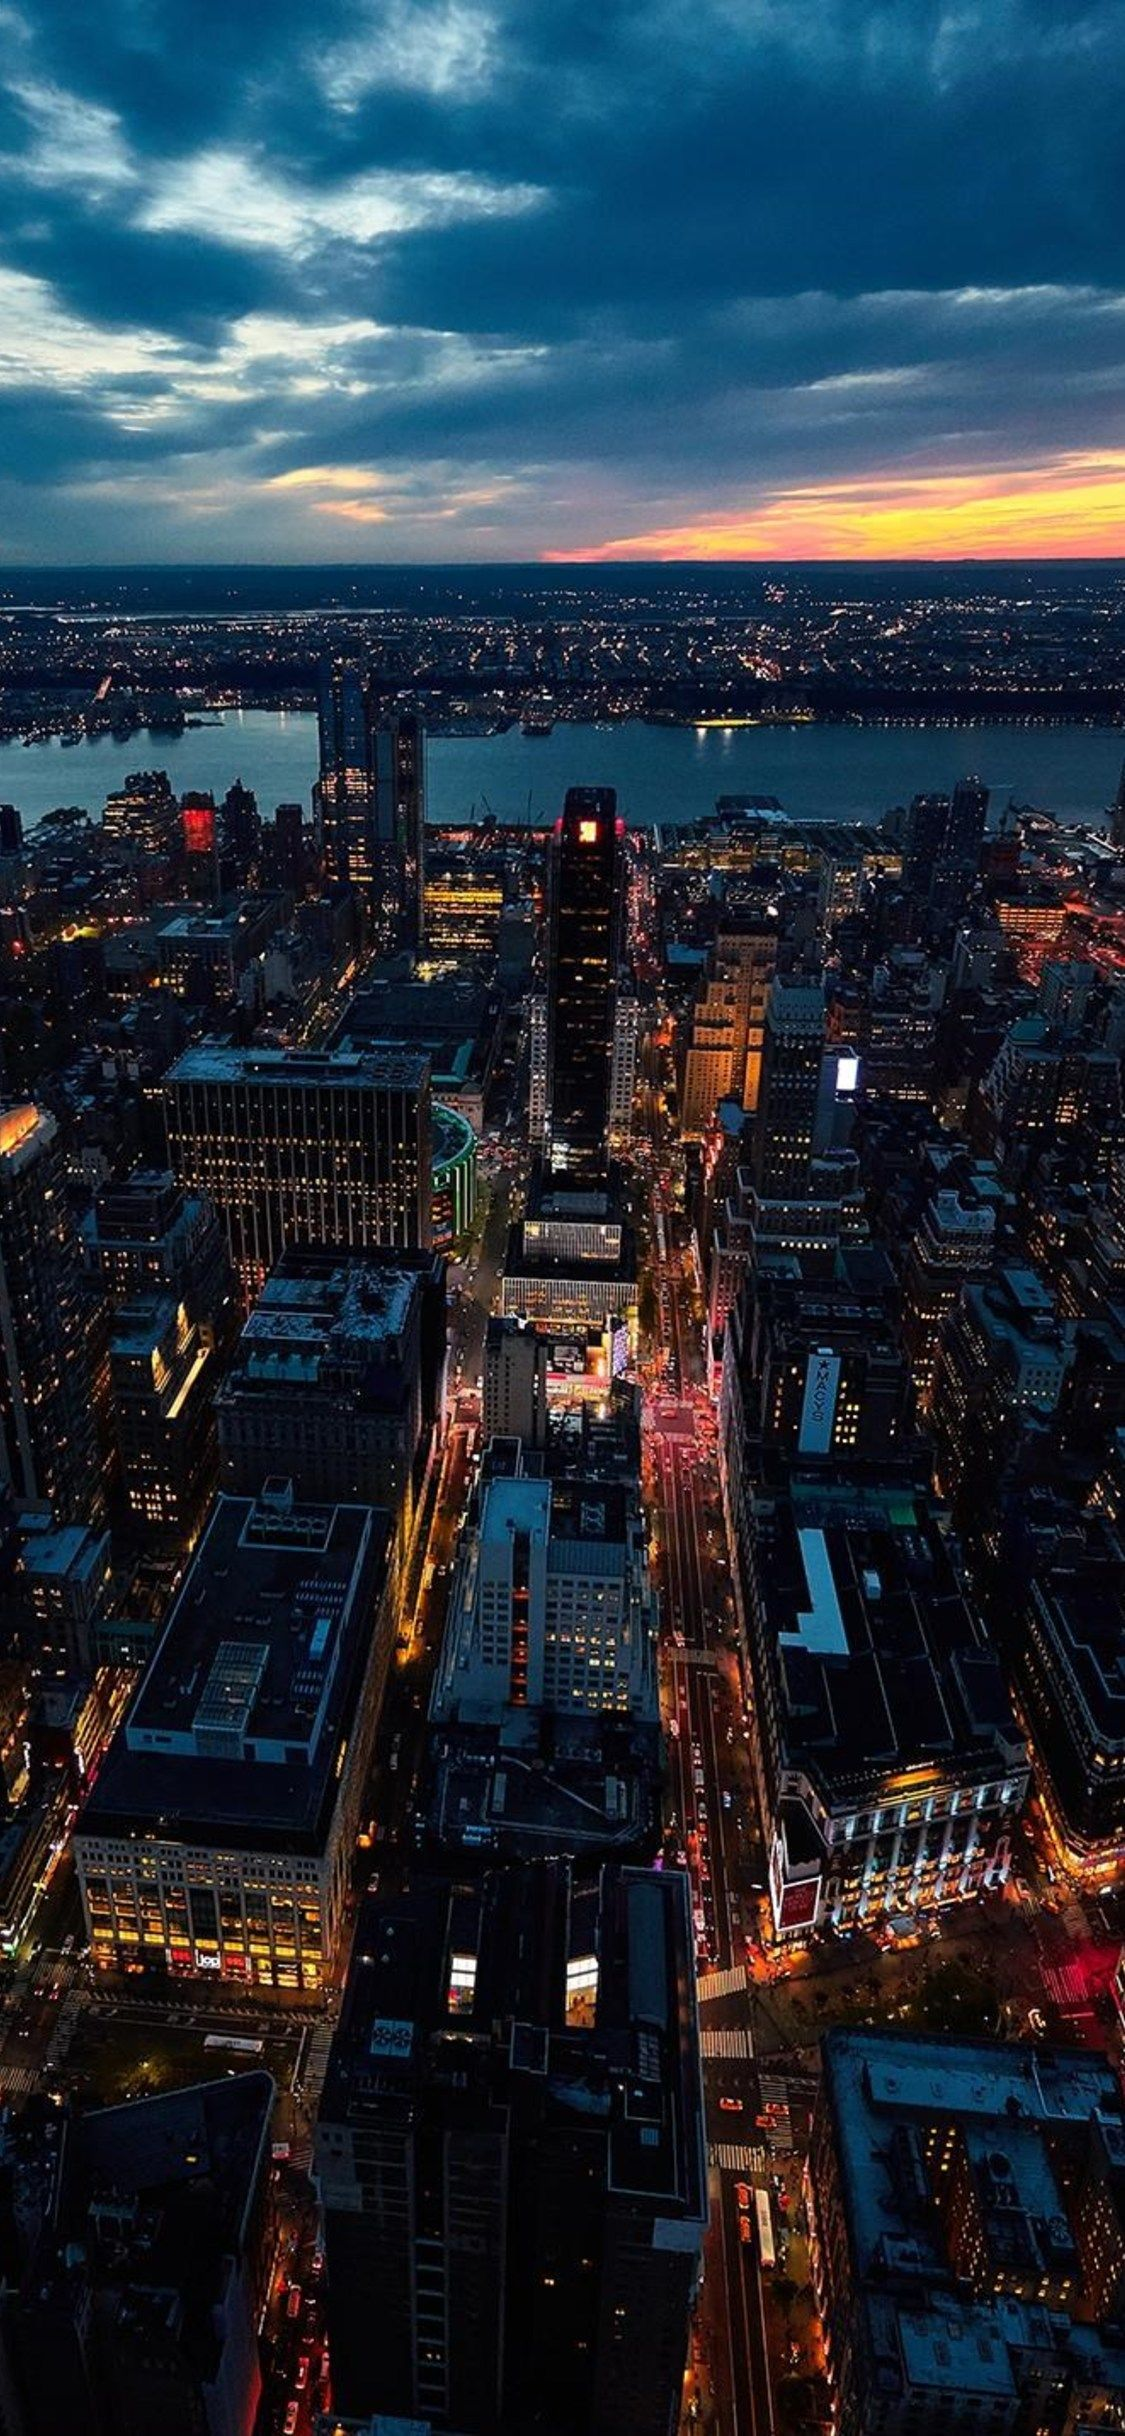 Download Wallpaper 3840x2400 City Lights Night City Buildings Street Architecture 4k Ultra Hd 16 10 Hd Background In 2020 Night City Android Wallpaper City Lights